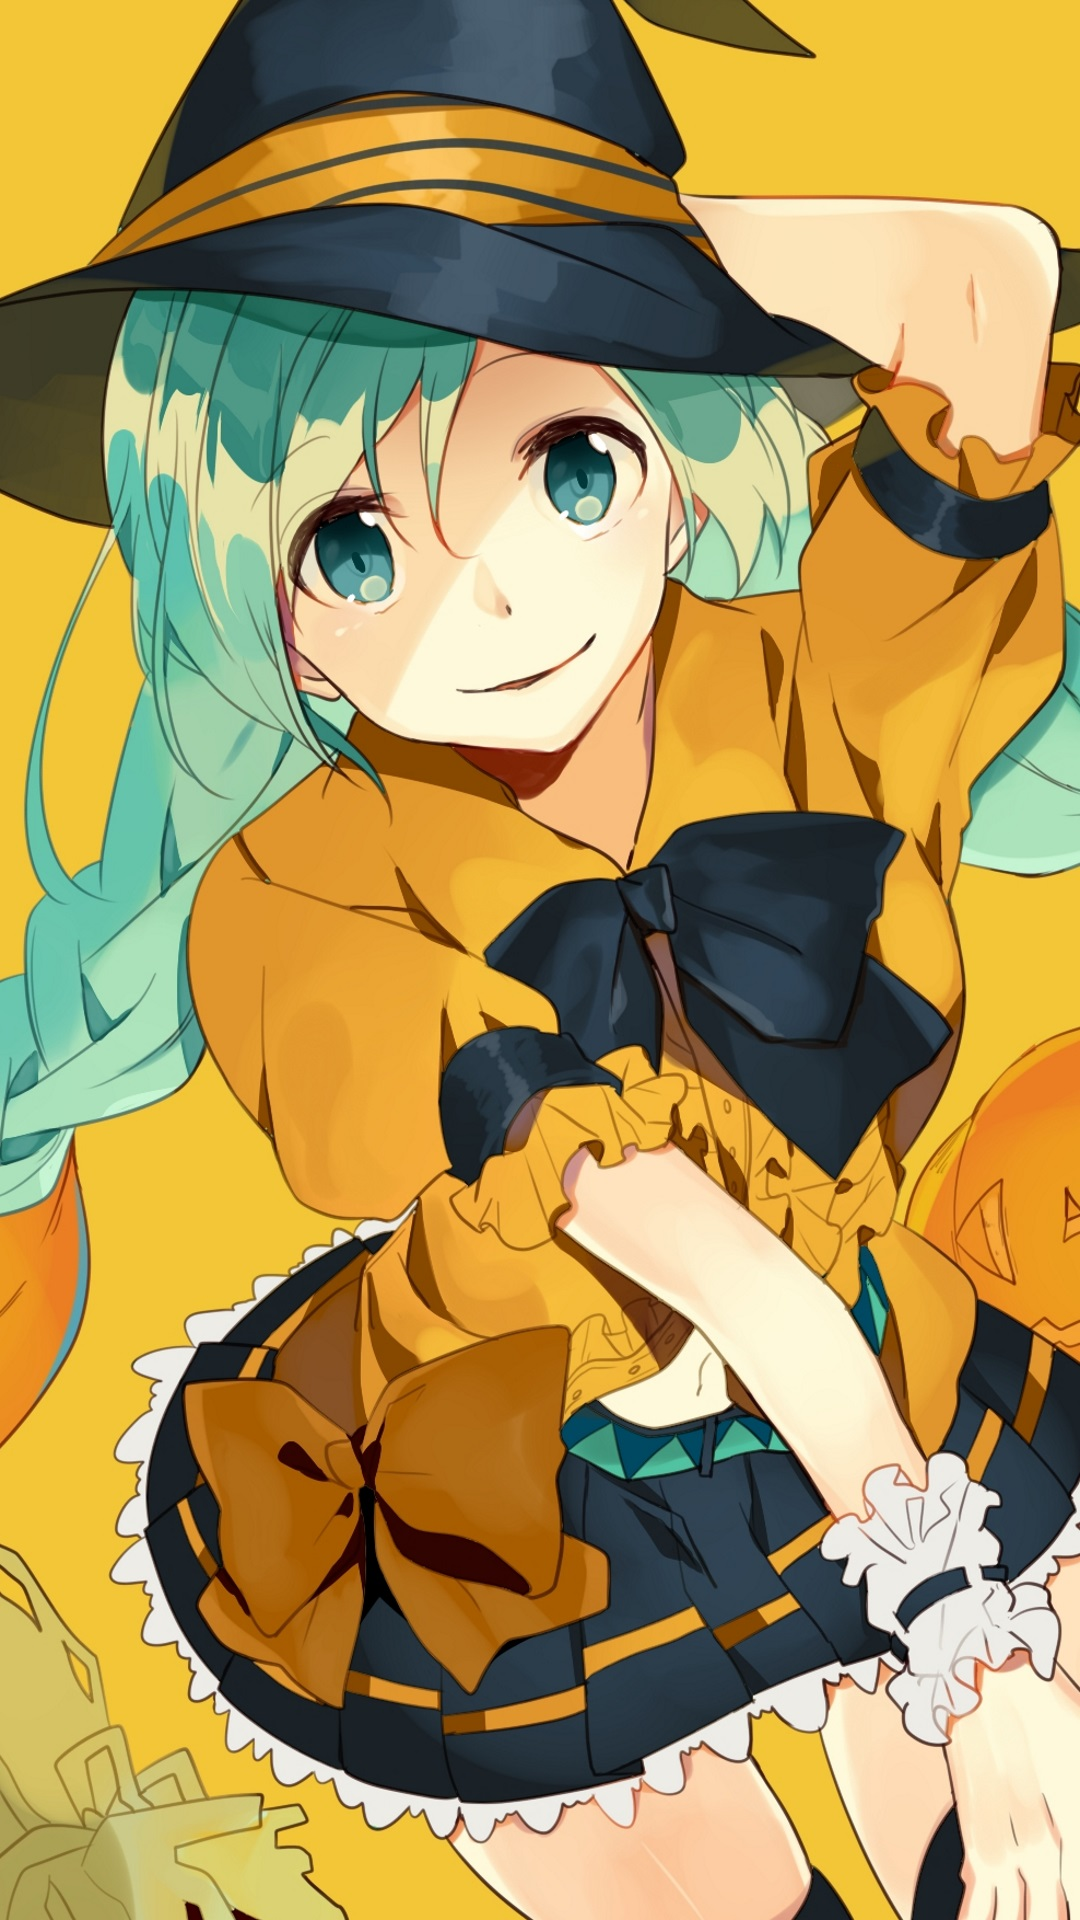 Halloween Anime 2015 Sony Xperia Wallpaper 1080 1920 Kawaii Mobile